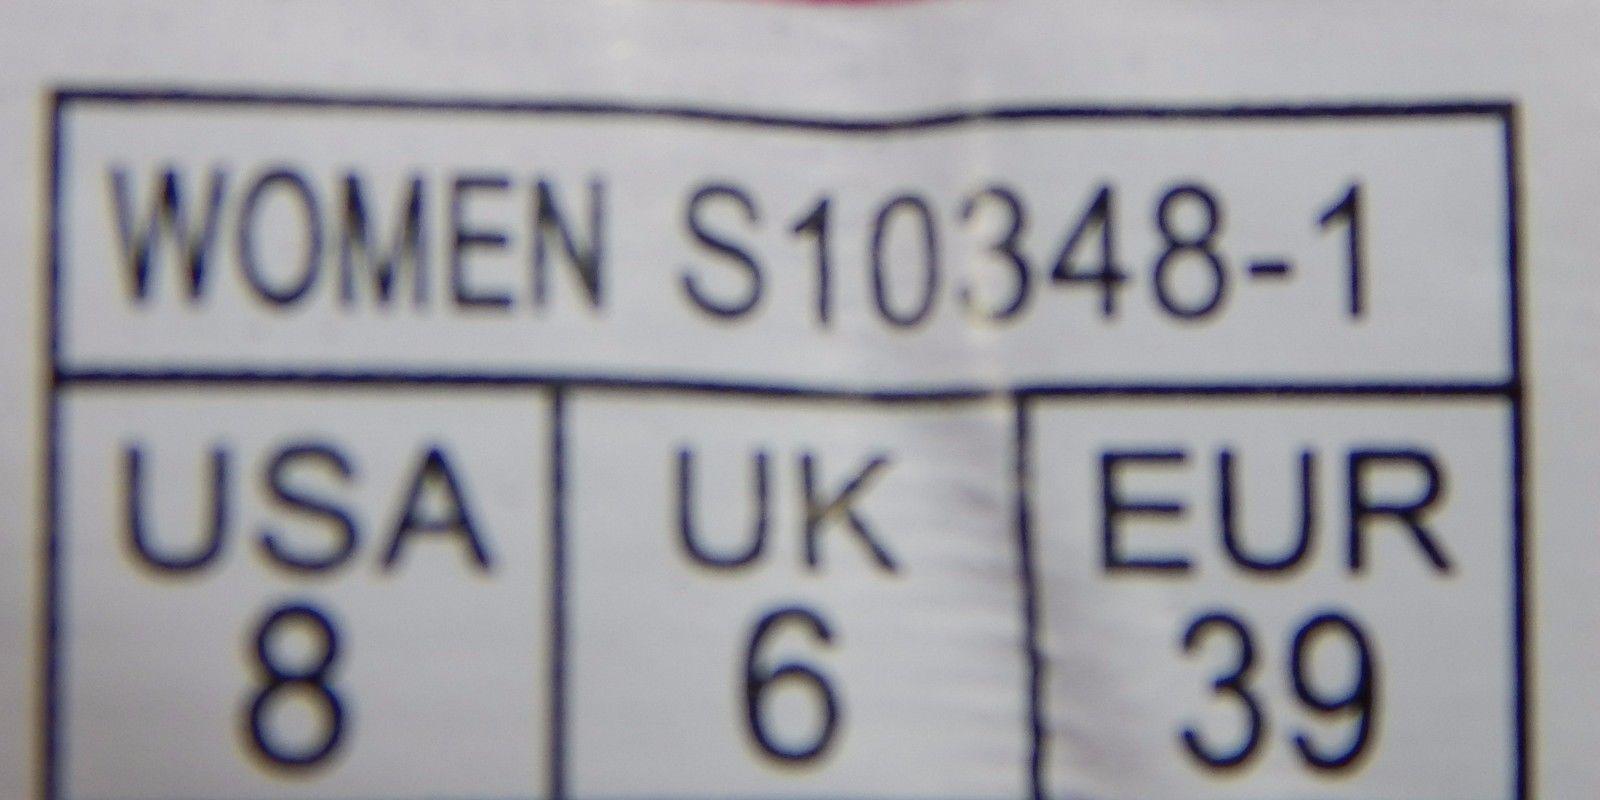 Saucony Hurricane ISO 3 Women's Running Shoes Size US 8 M (B) EU 39 S10348-1